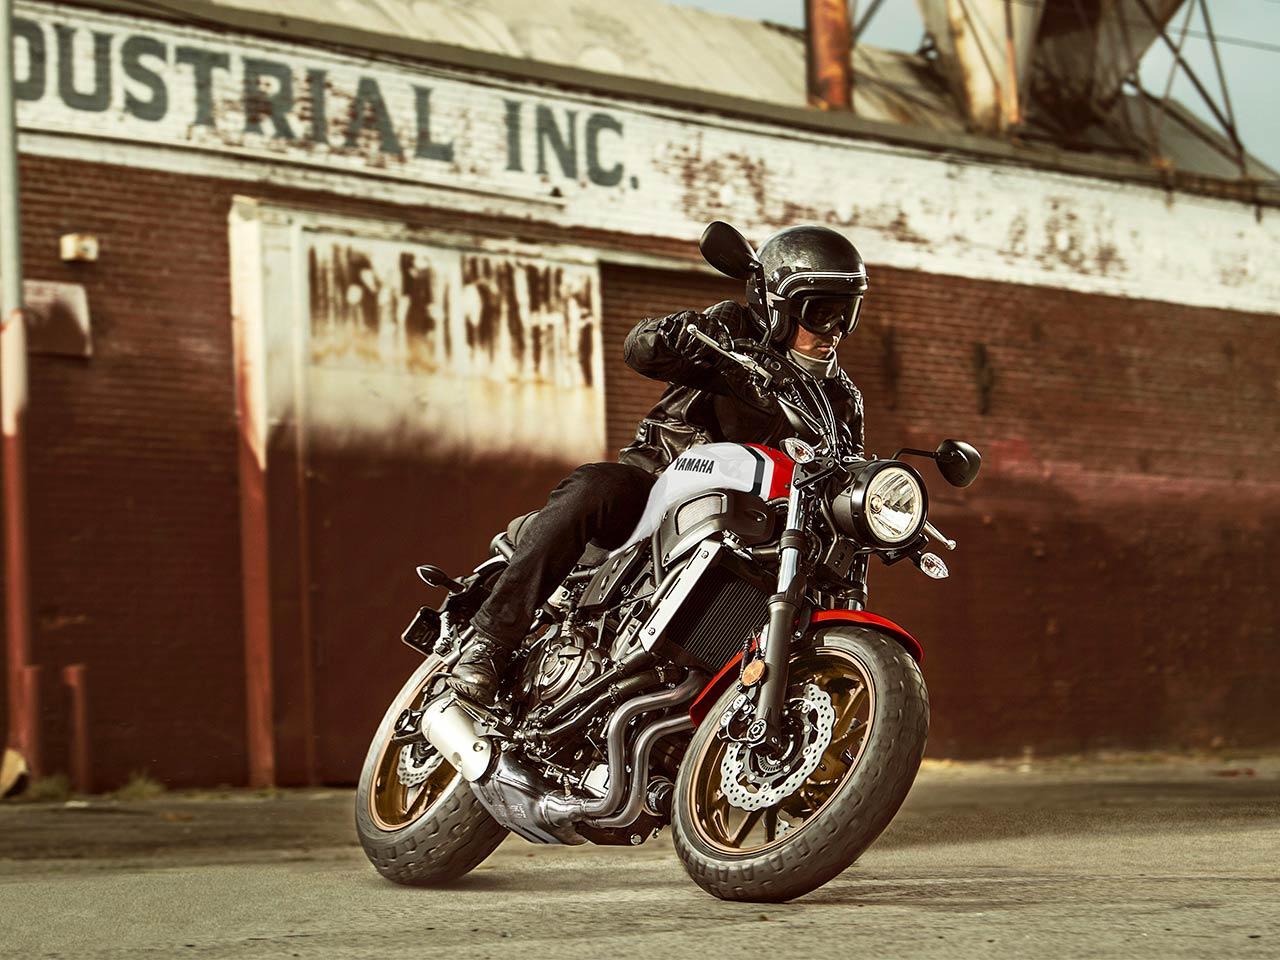 2020 Yamaha XSR700 Gallery 1